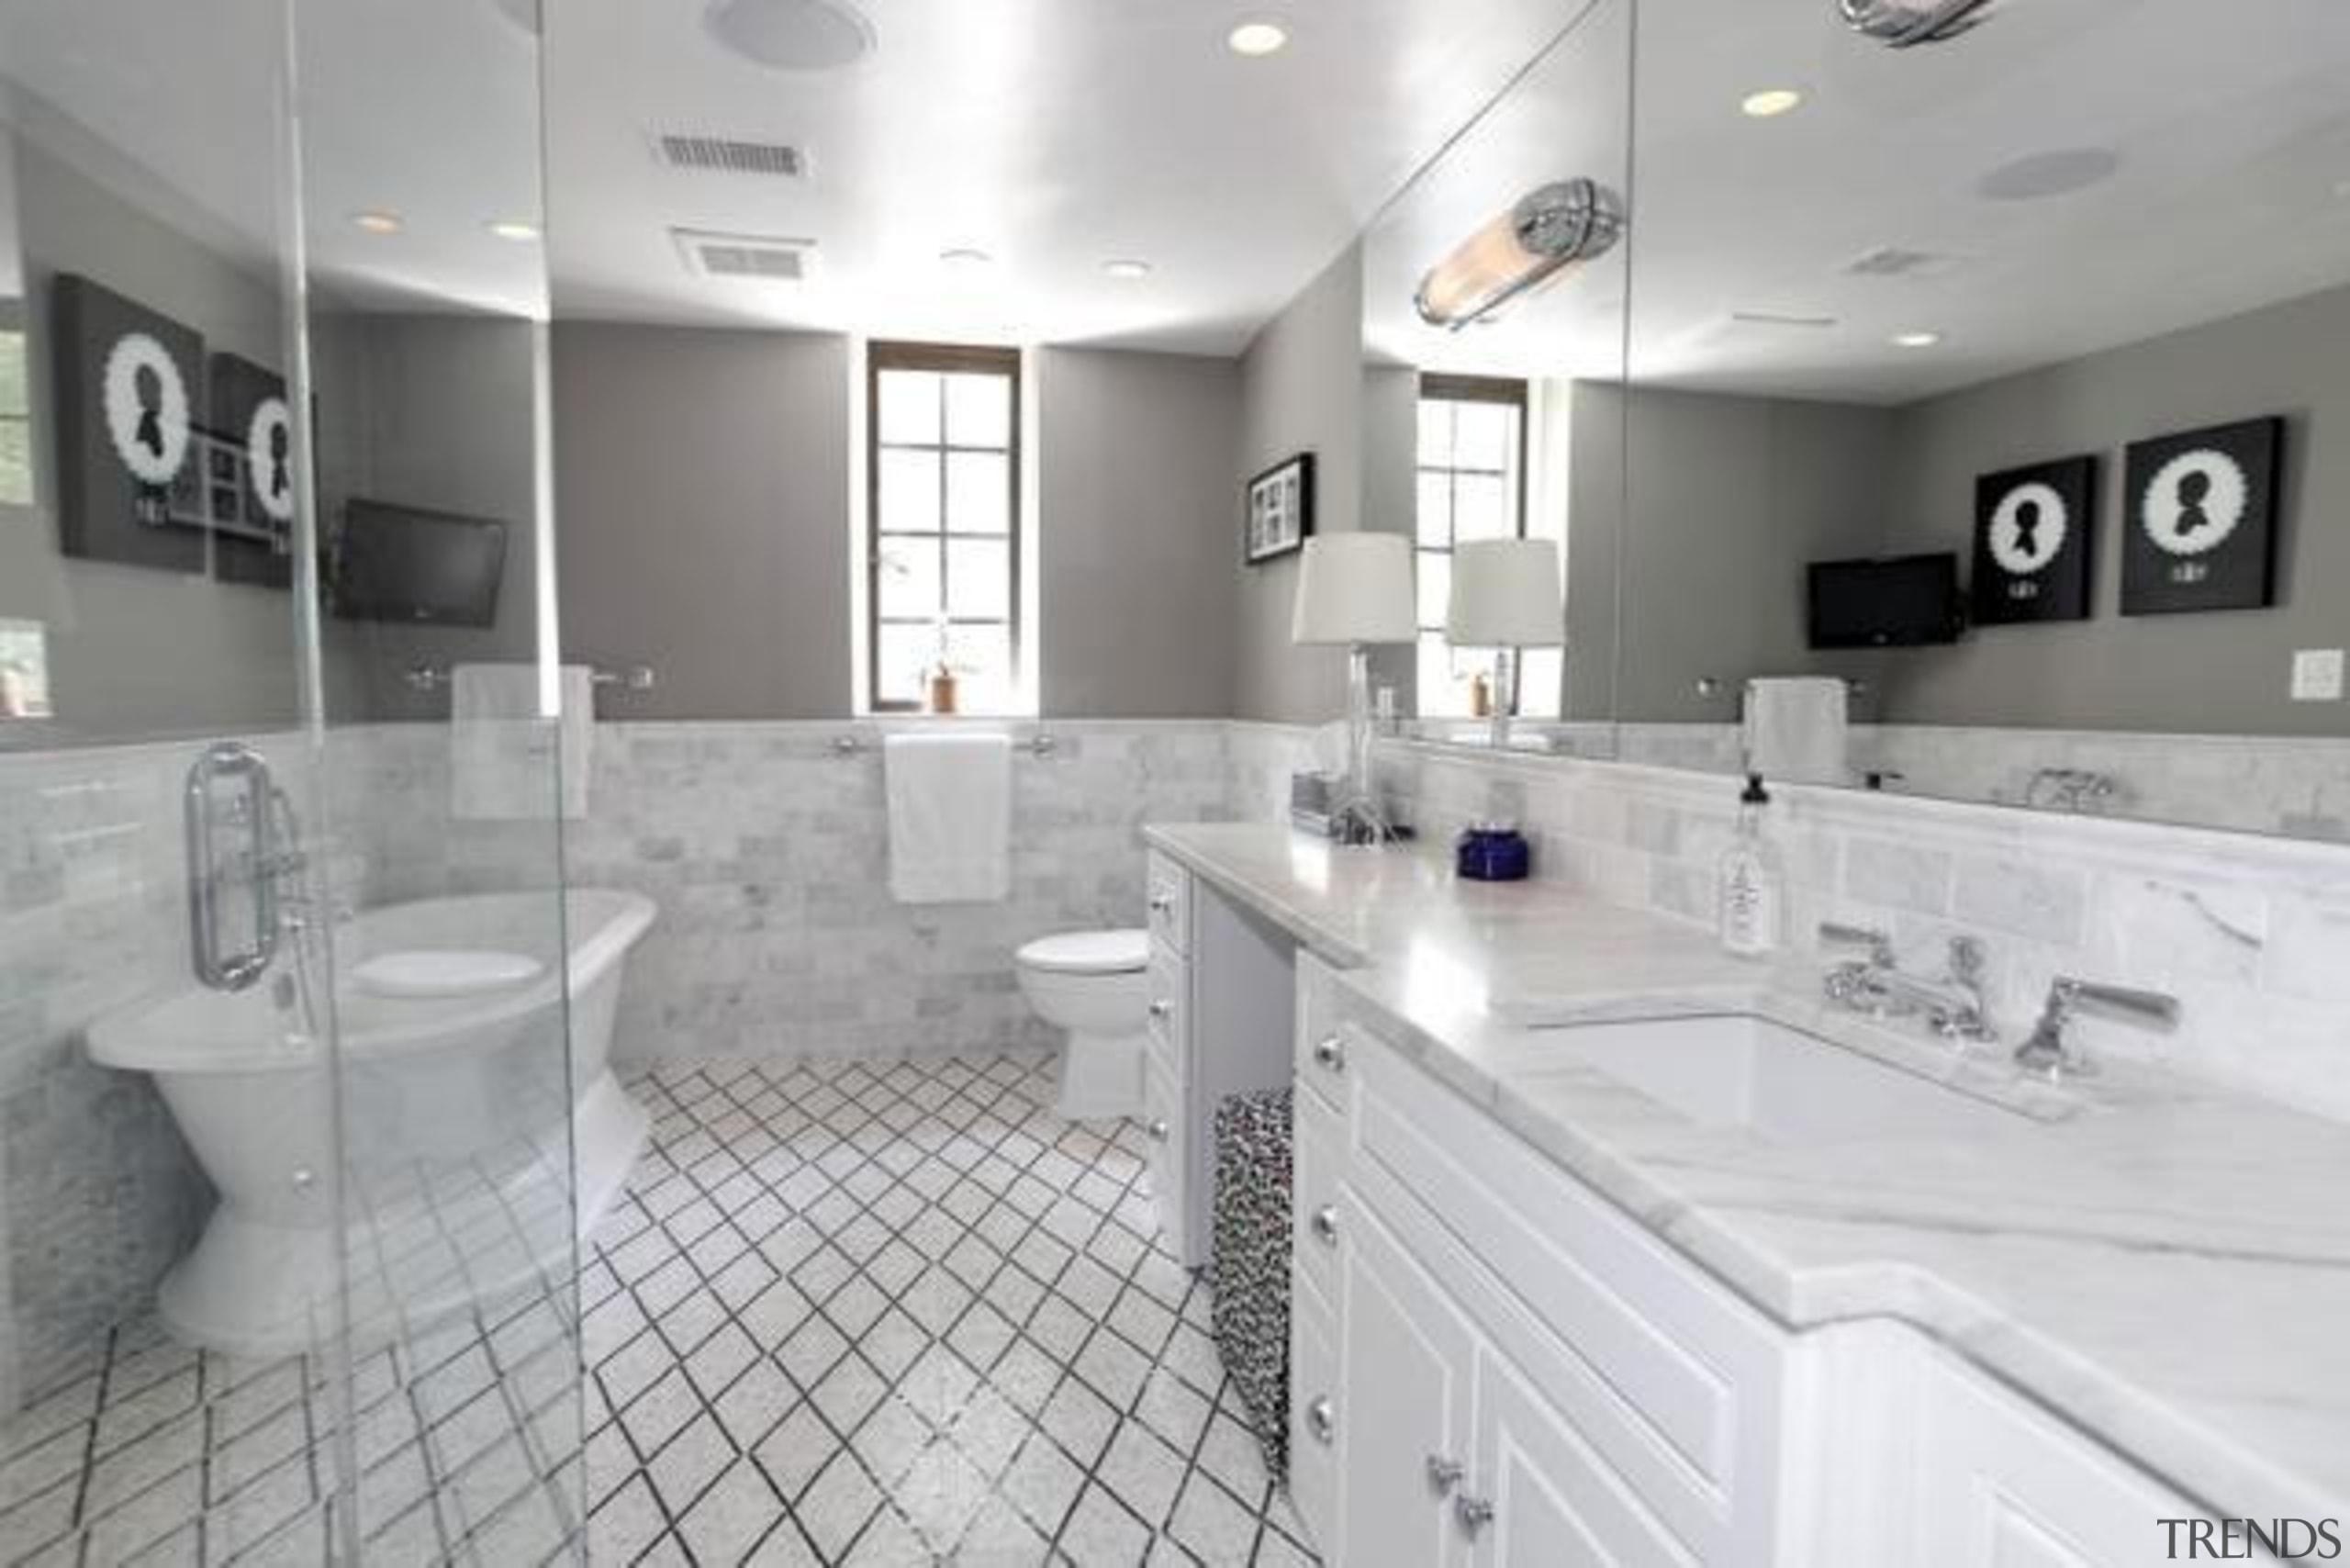 Original story from Trulia bathroom, countertop, floor, home, interior design, kitchen, property, real estate, room, sink, gray